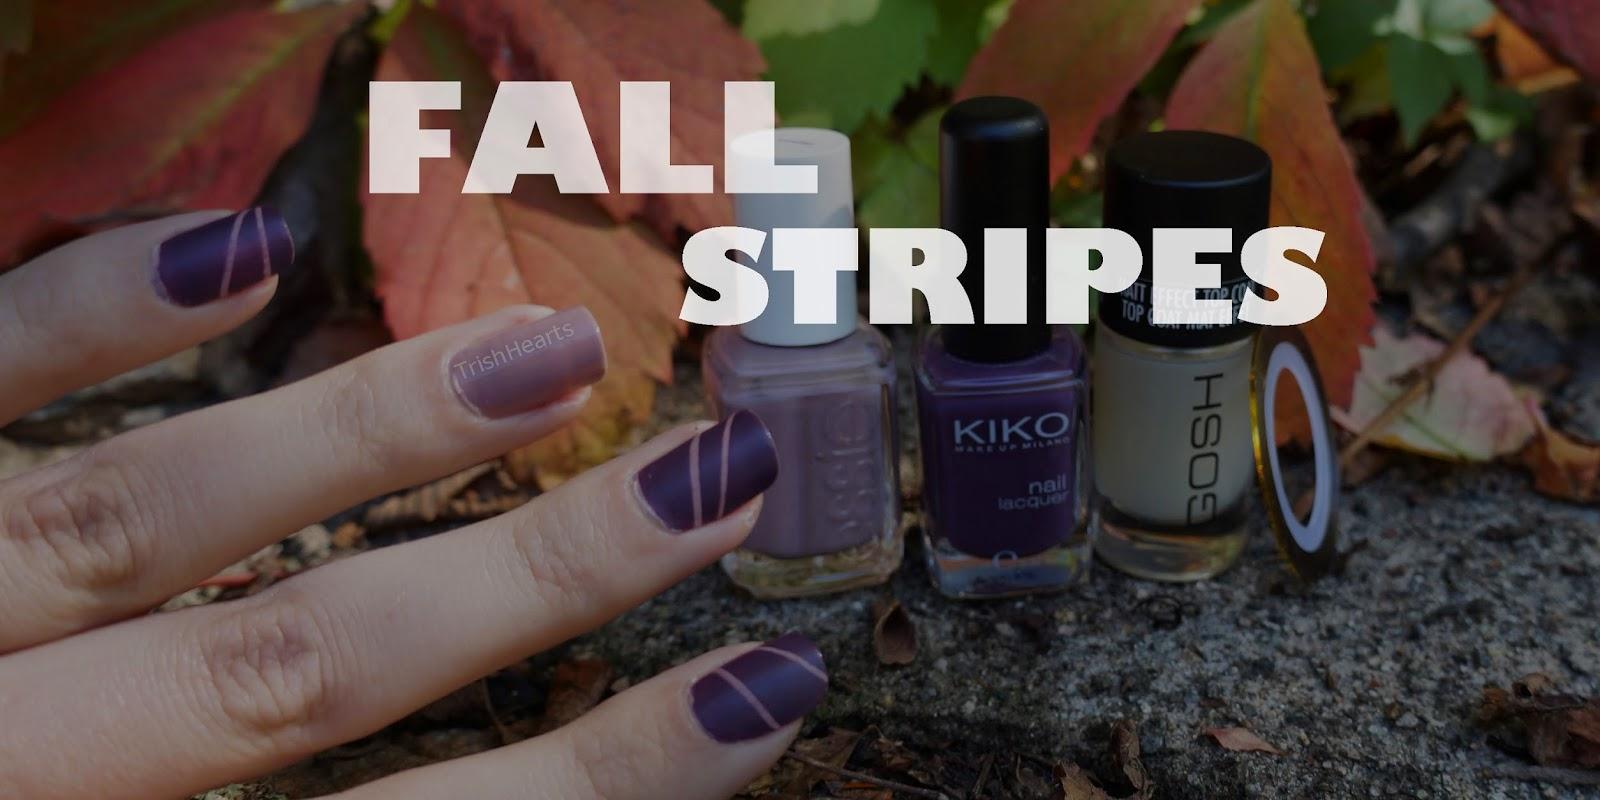 TrishHearts: ℘ Manicure Monday - Fall Stripes